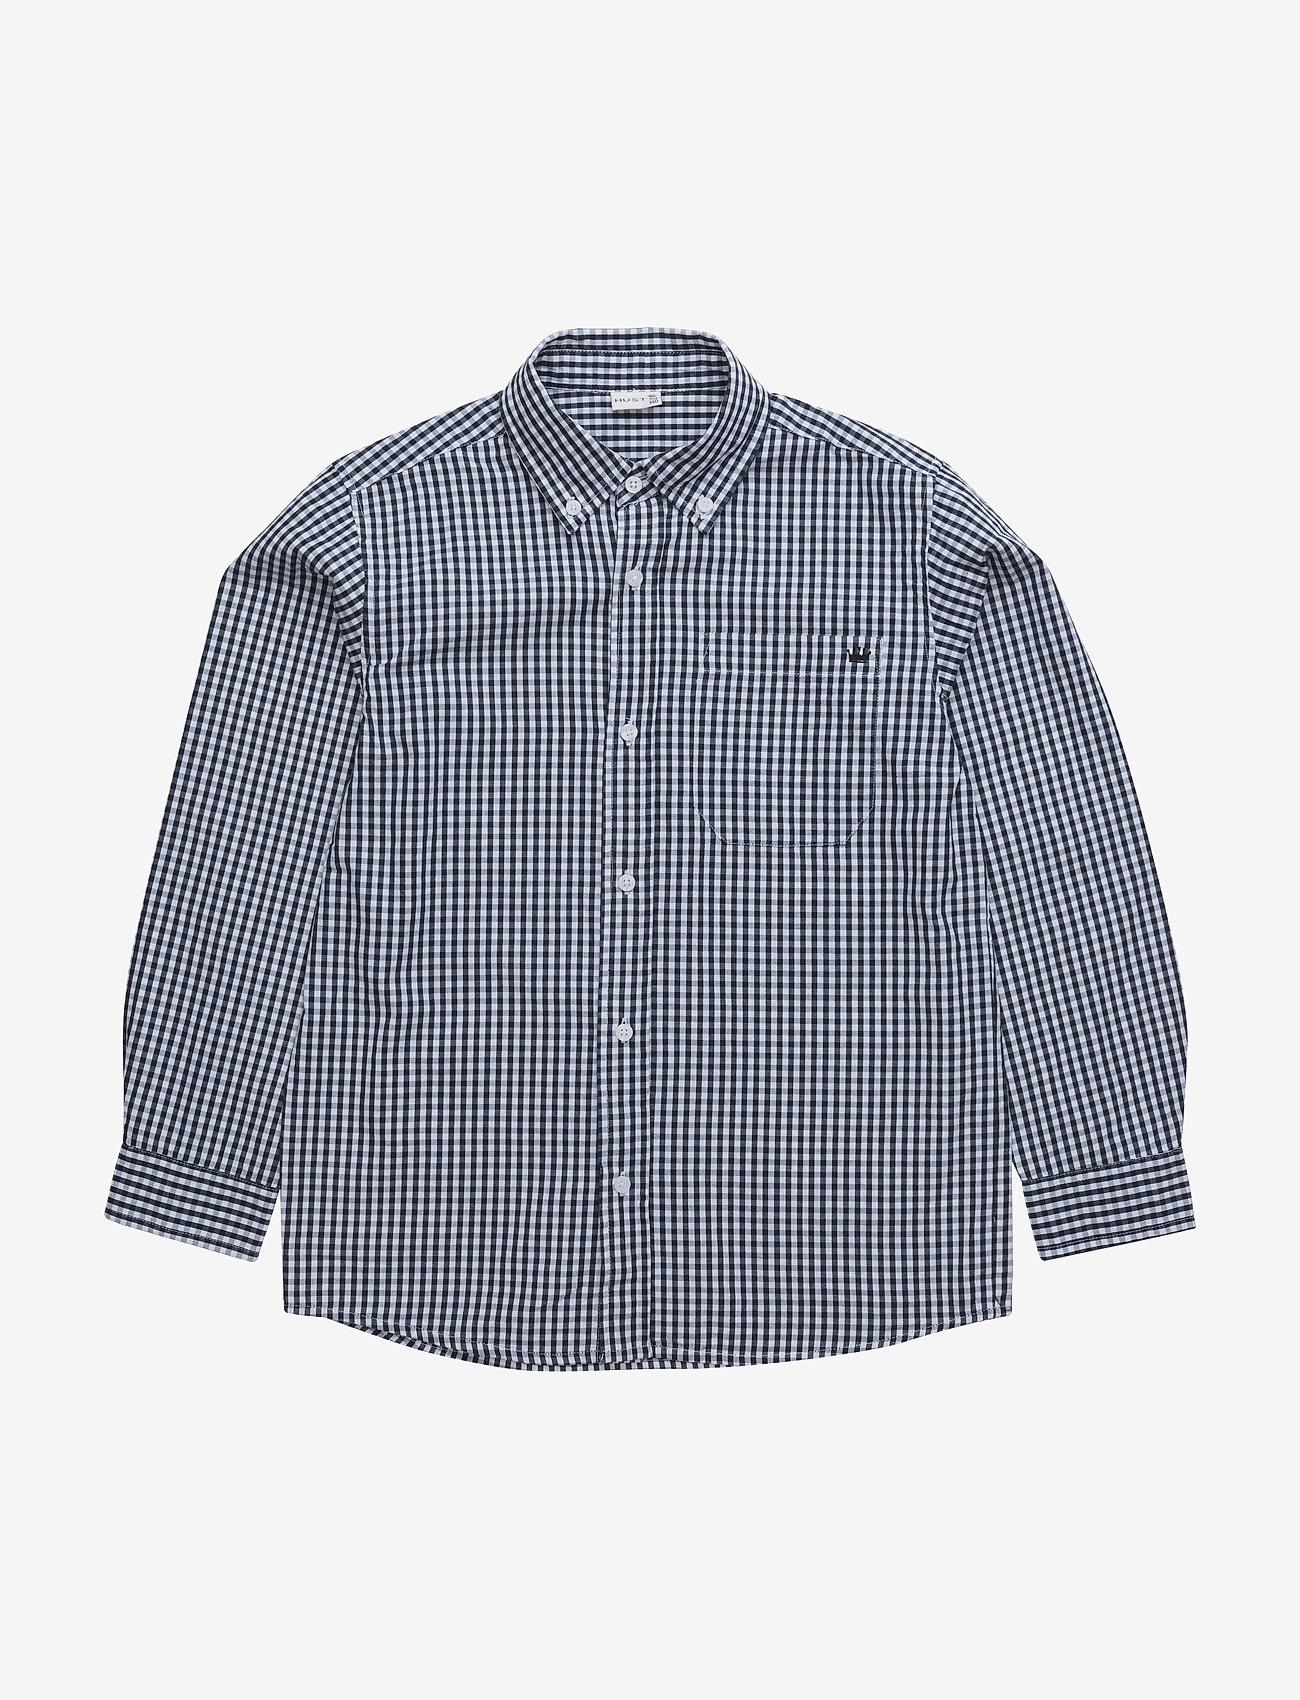 Hust & Claire - Rene - Shirt - shirts - navy - 0